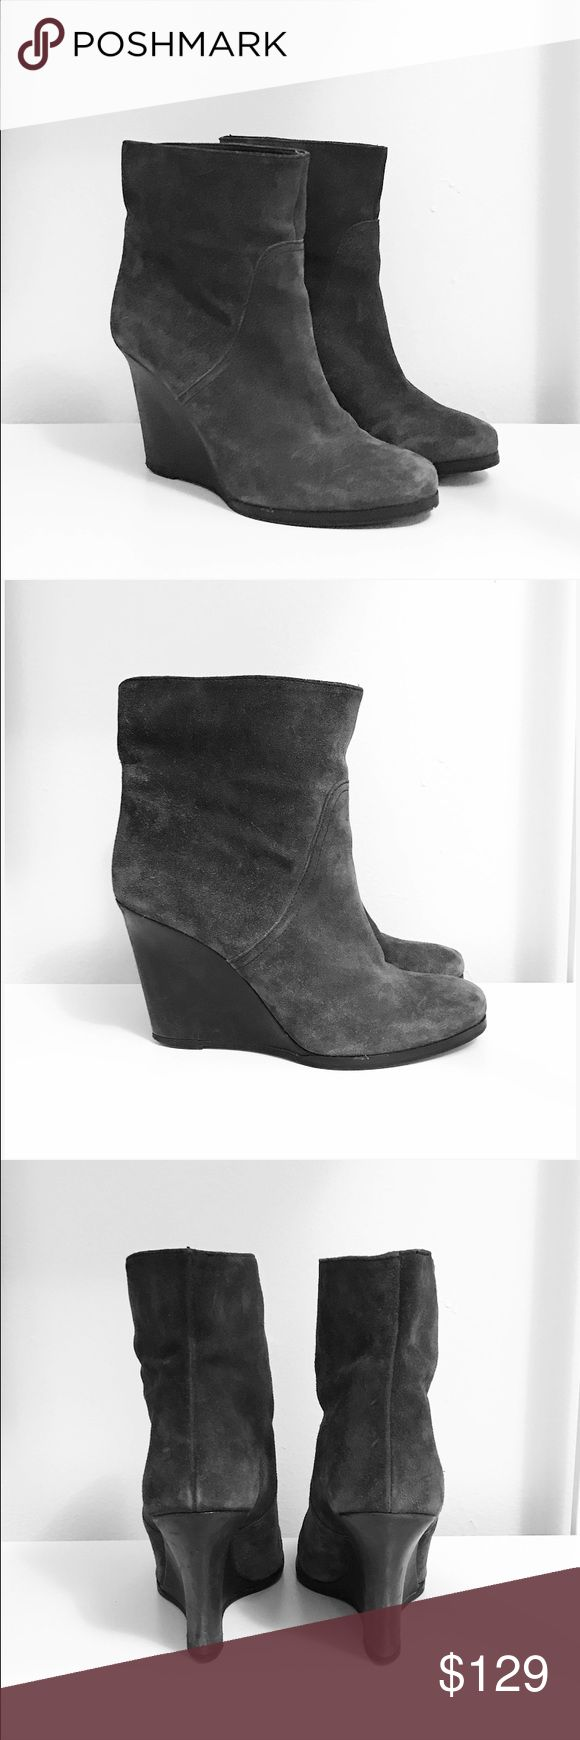 "BOSS Orange Hugo Boss Grey Suede Wedge Booties Suede upper, leather lining, 3.5"" wedge heel BOSS ORANGE Shoes Ankle Boots & Booties"